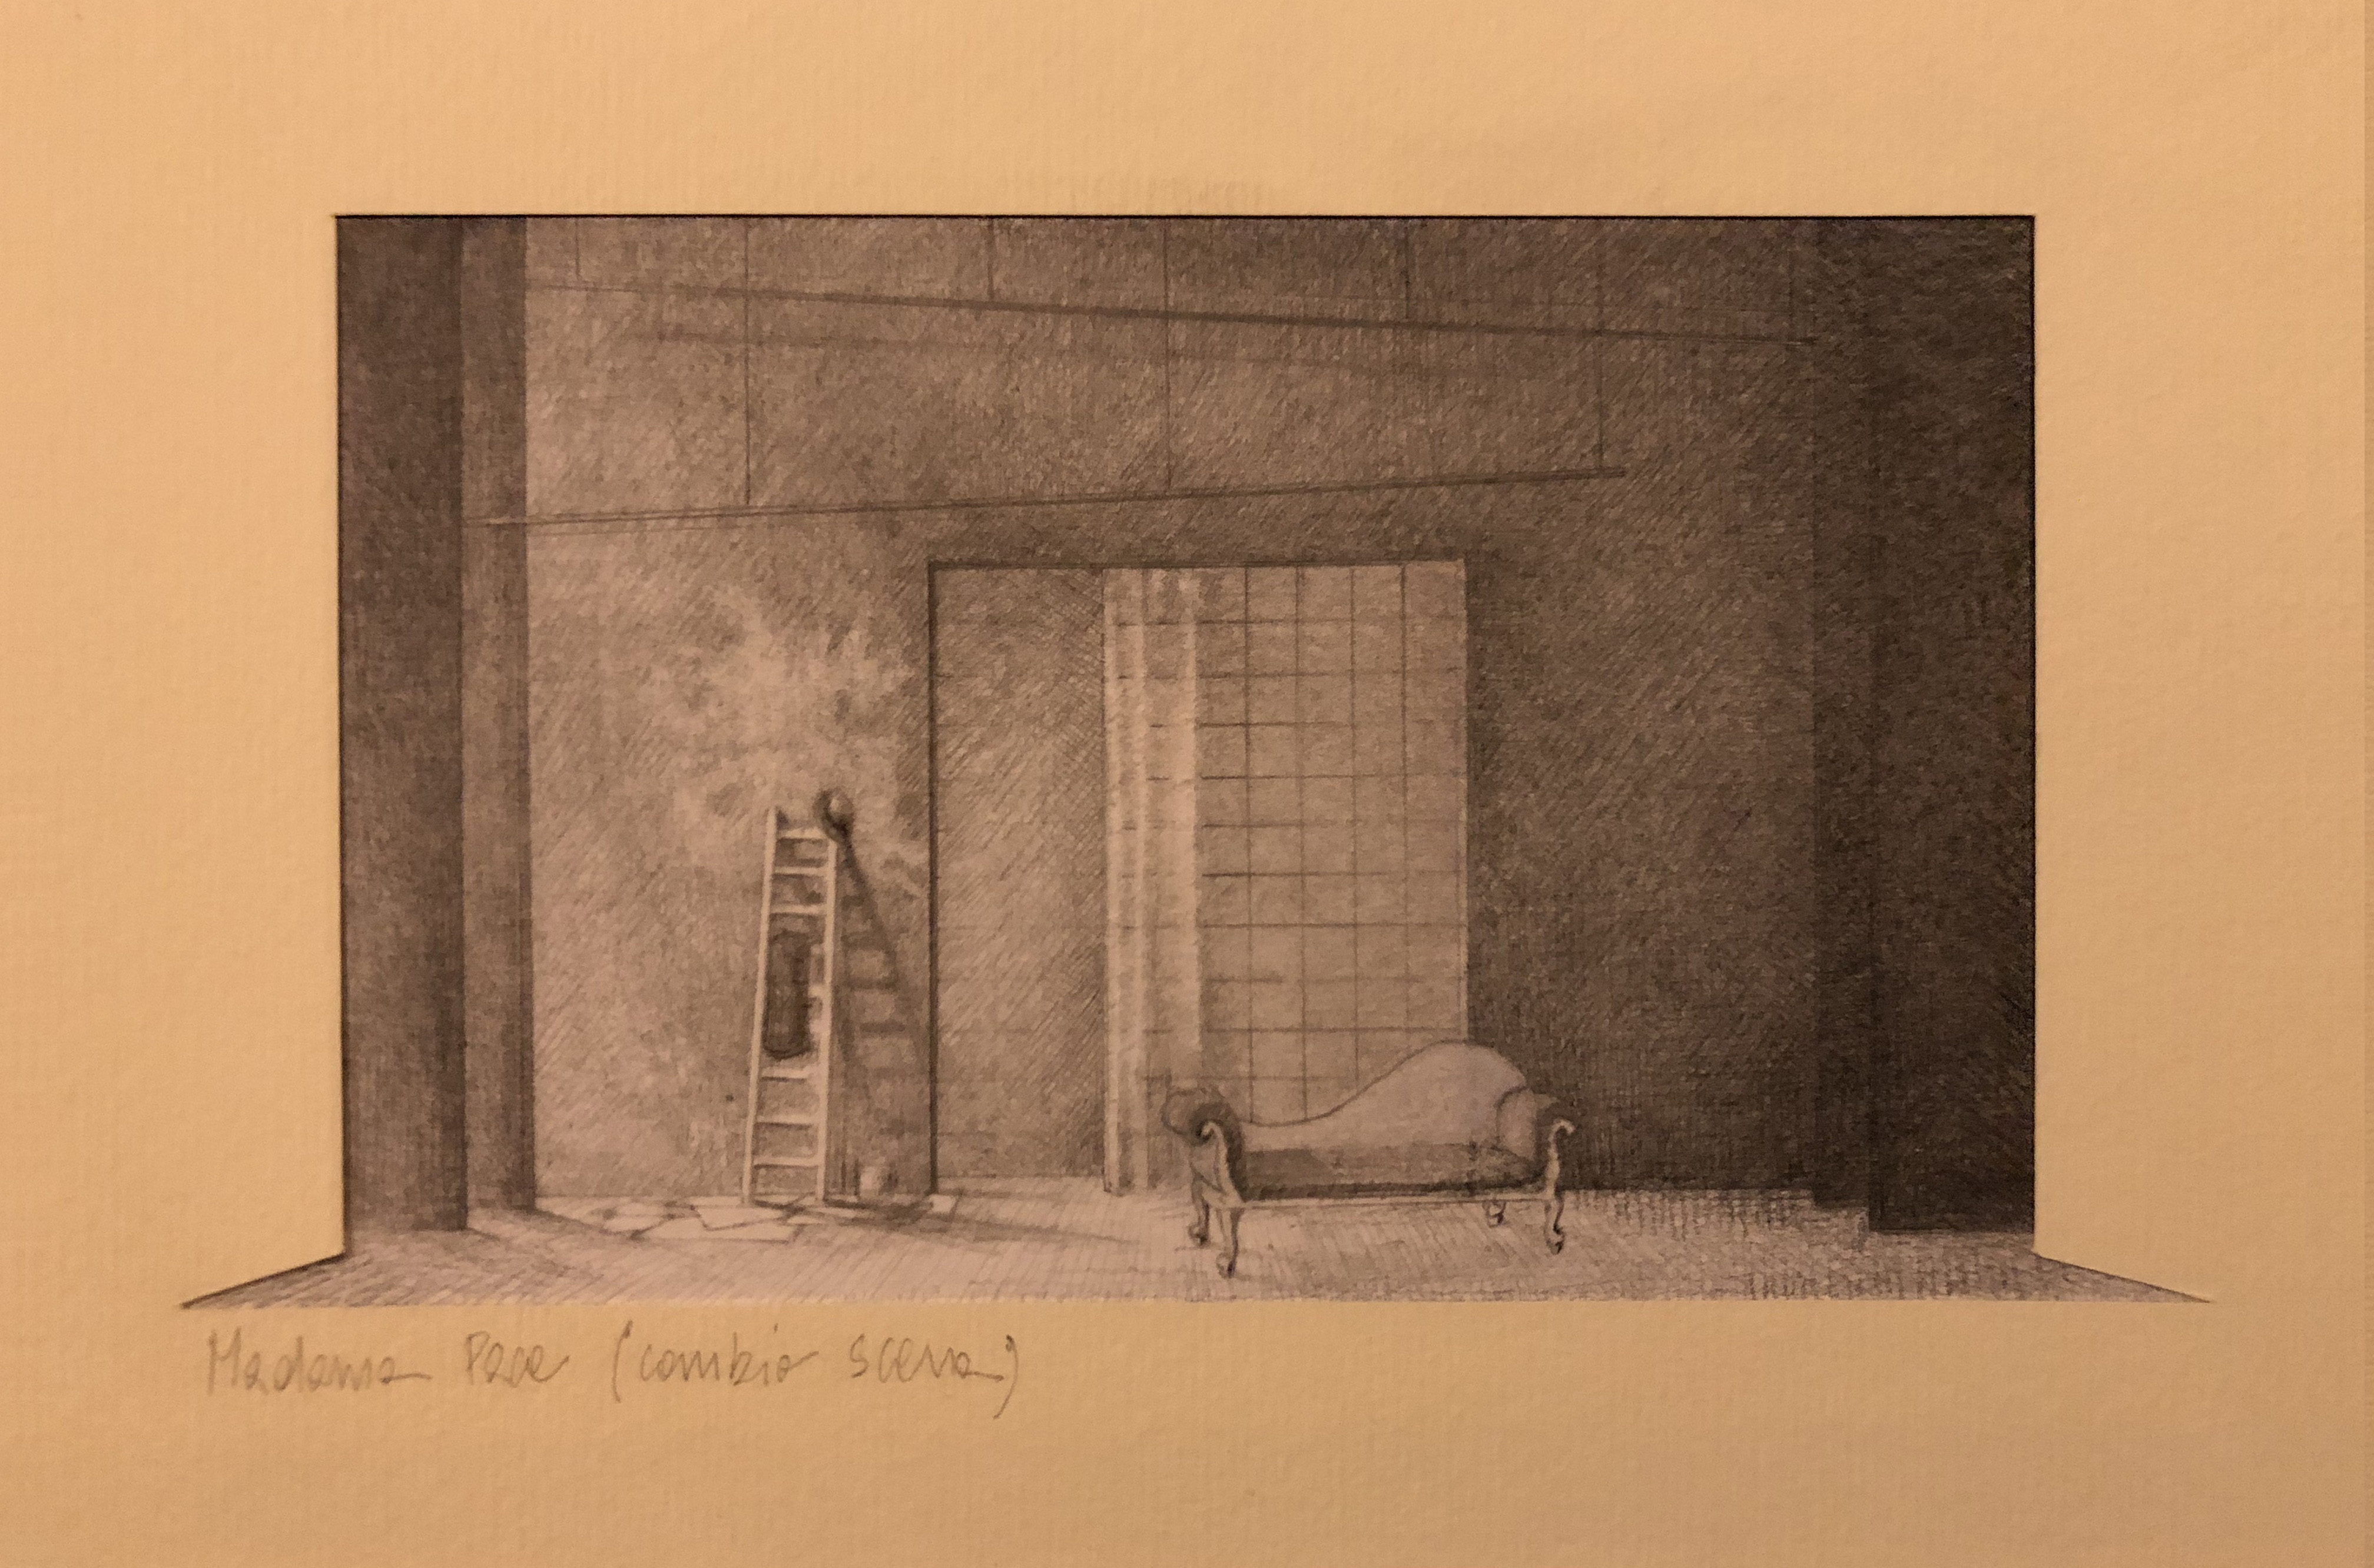 II Scene